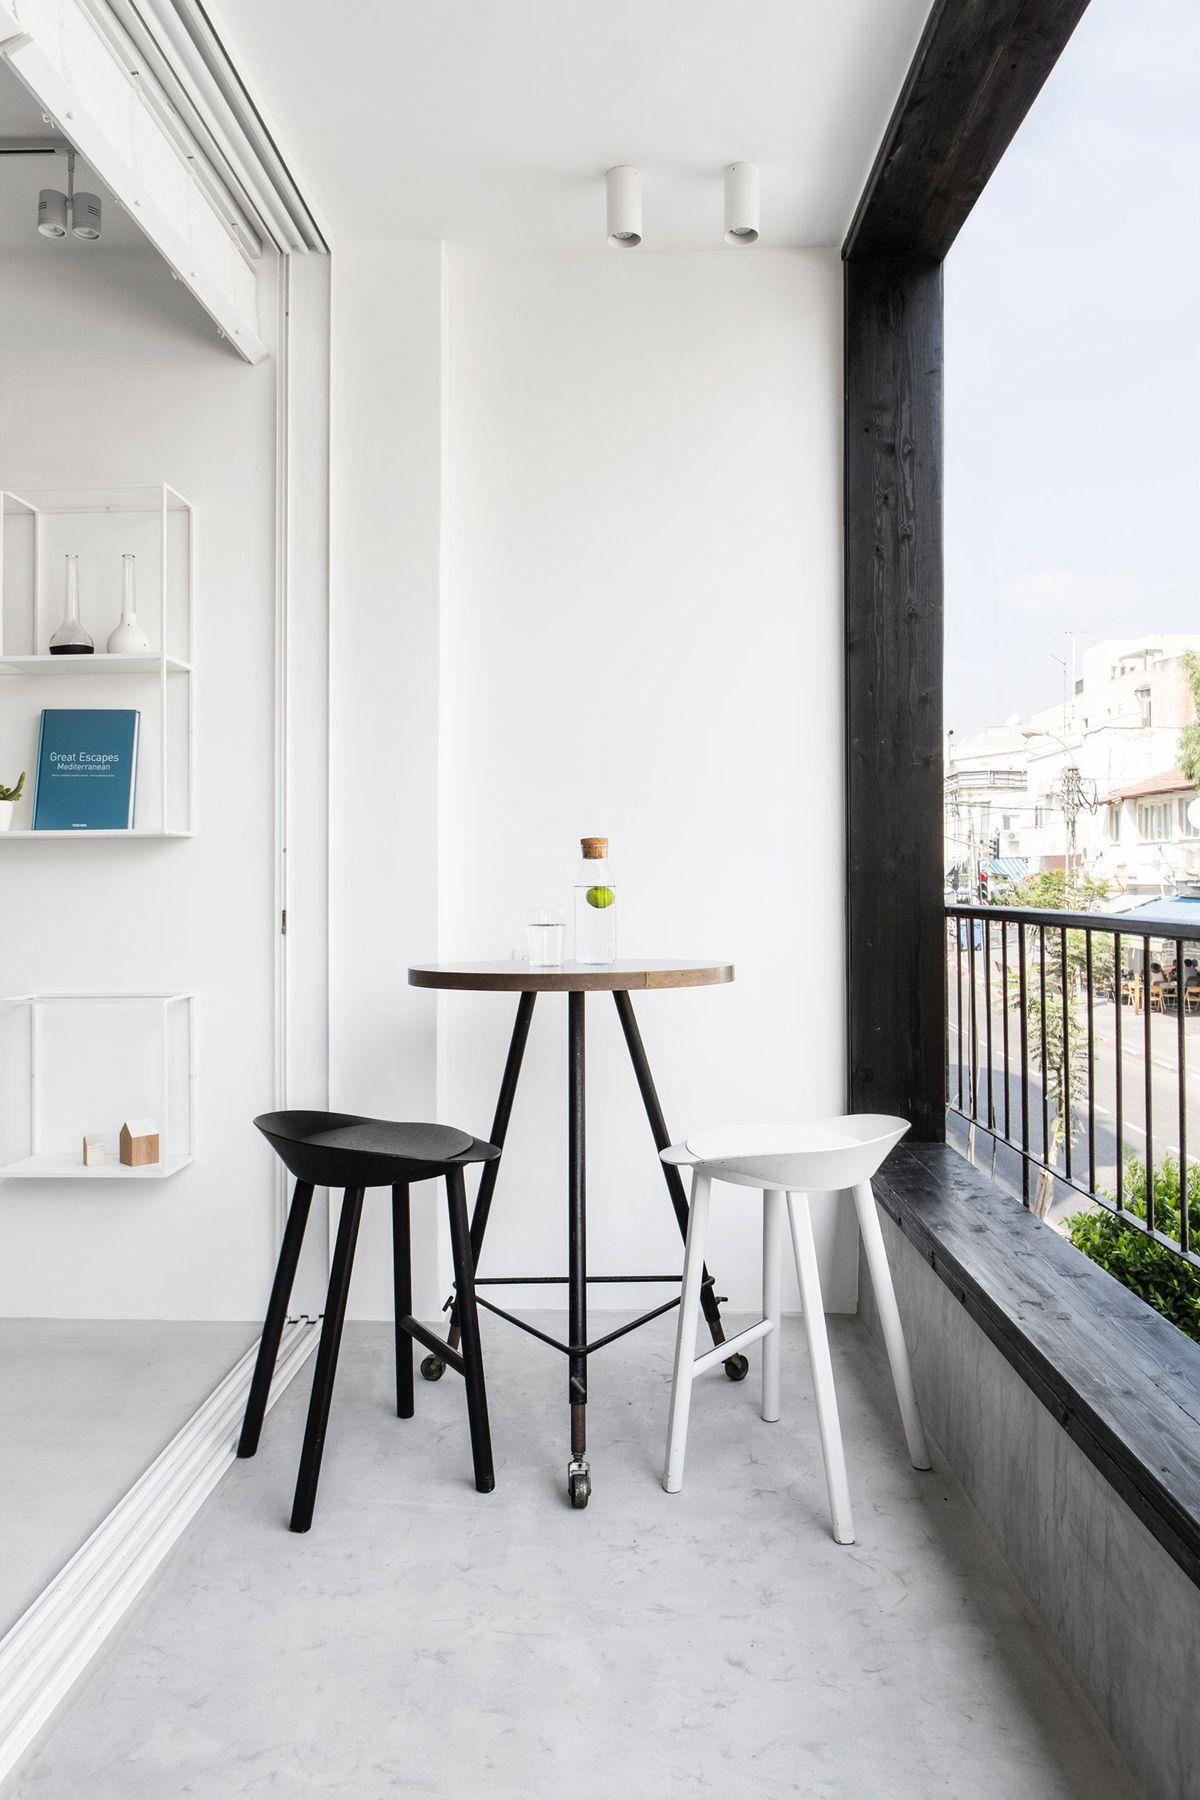 Comfortable and minimalist balcony design